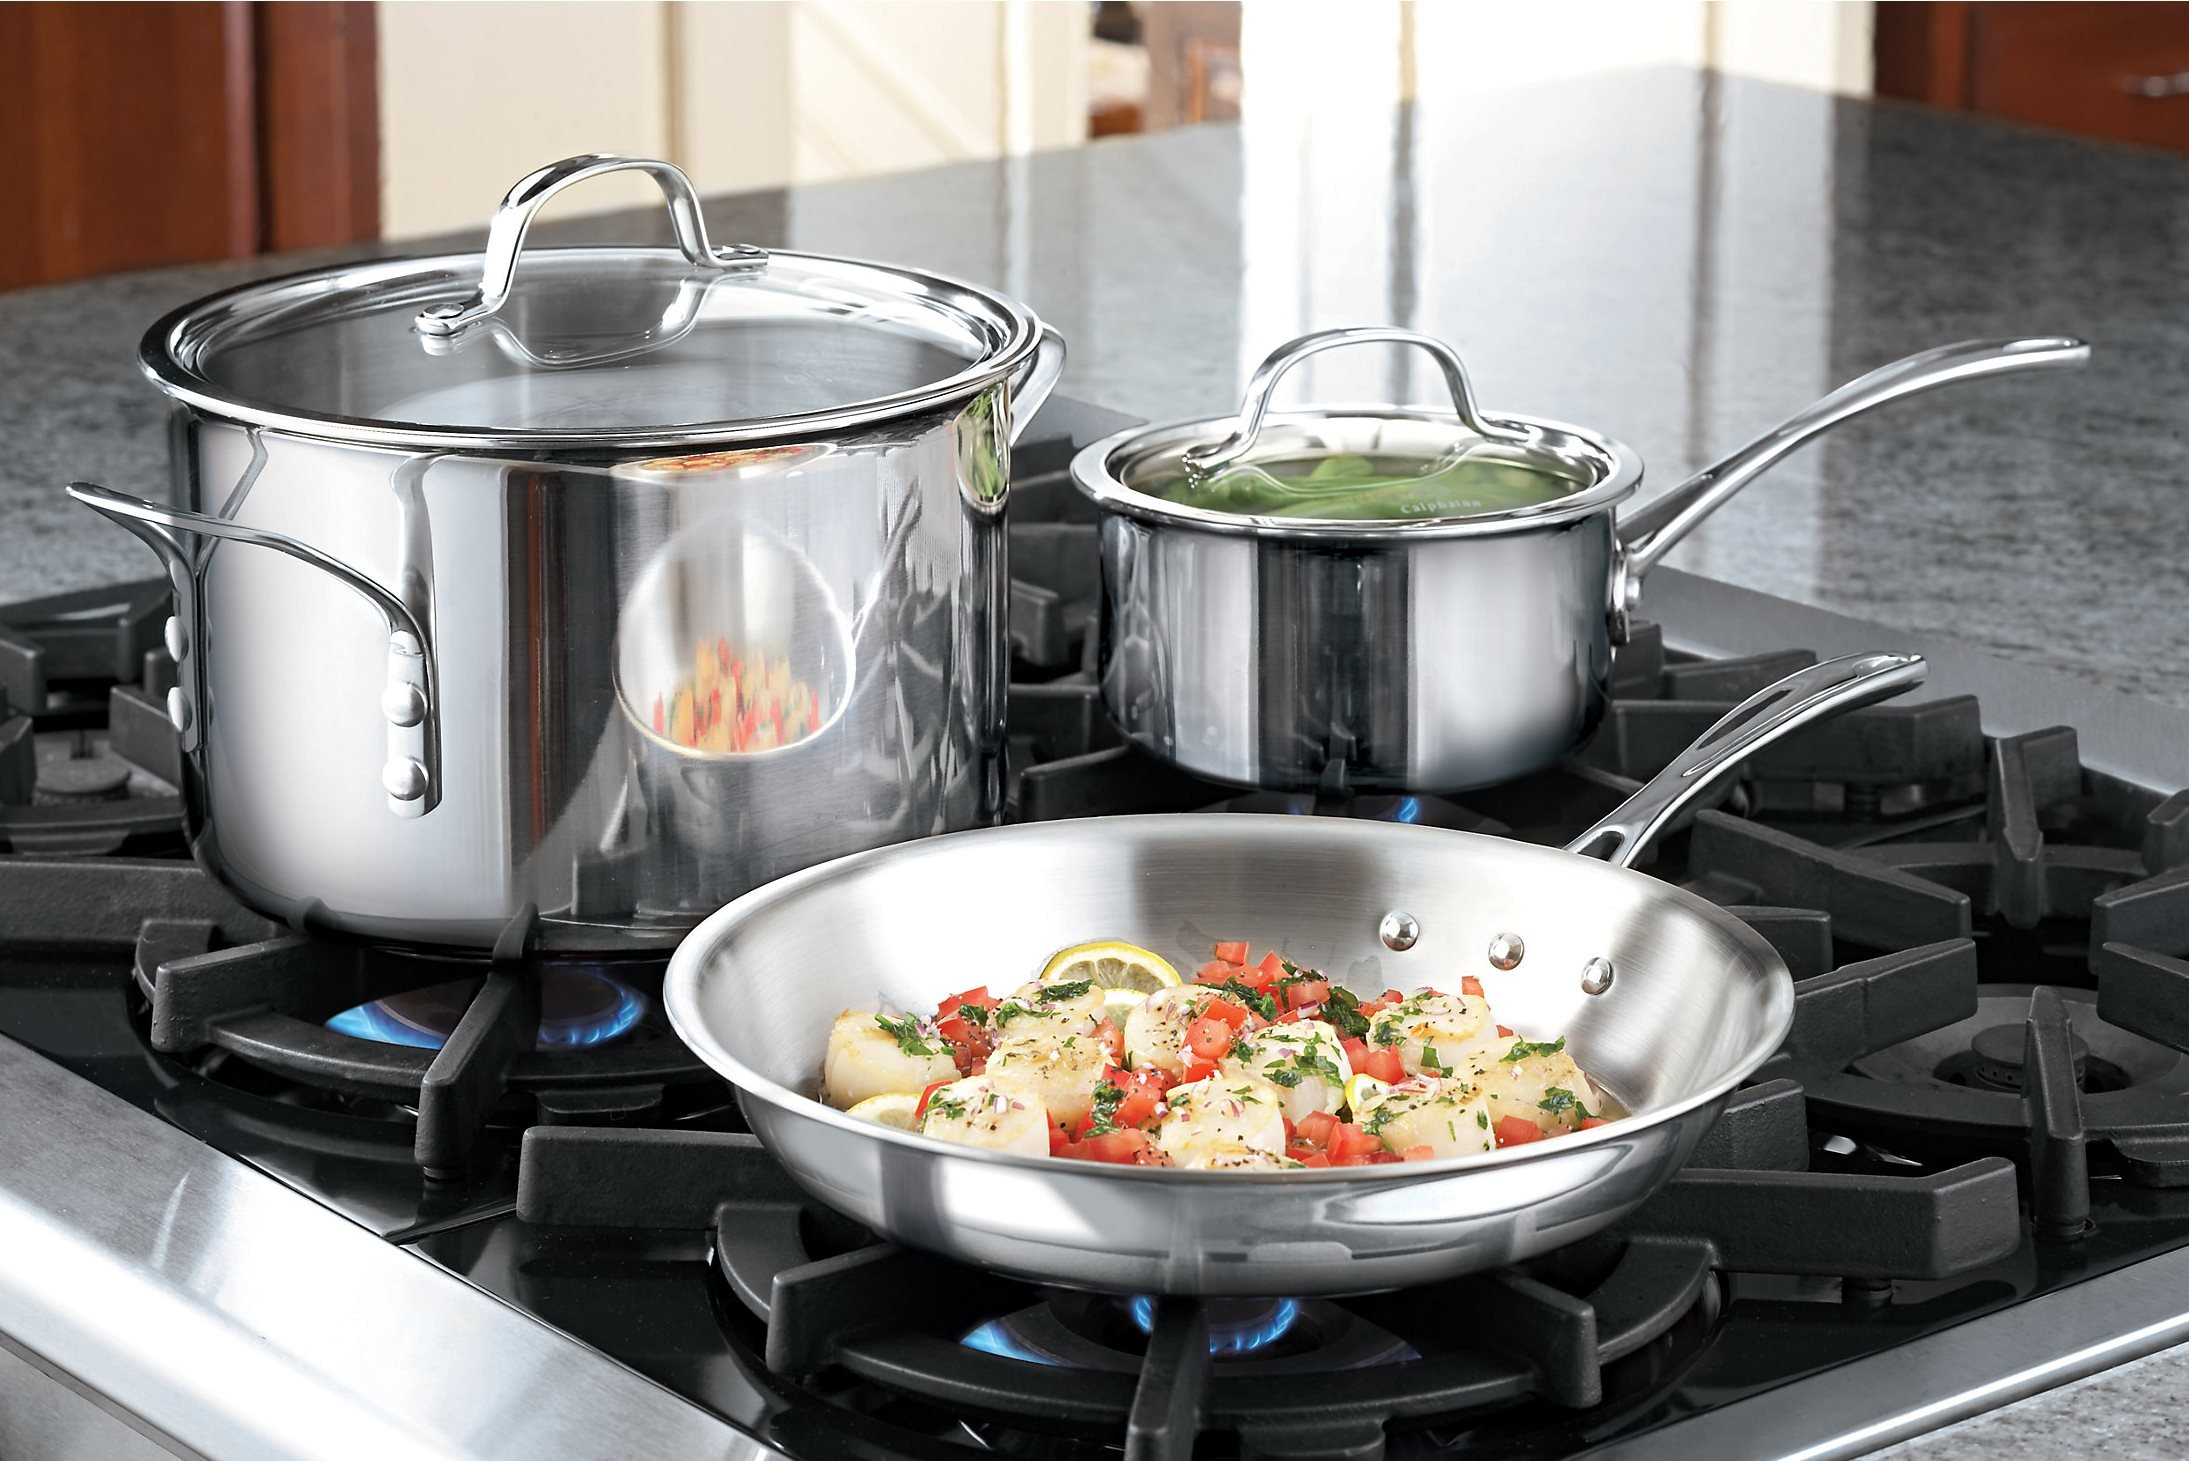 Calphalon Tri-Ply Stainless Steel Saucepan